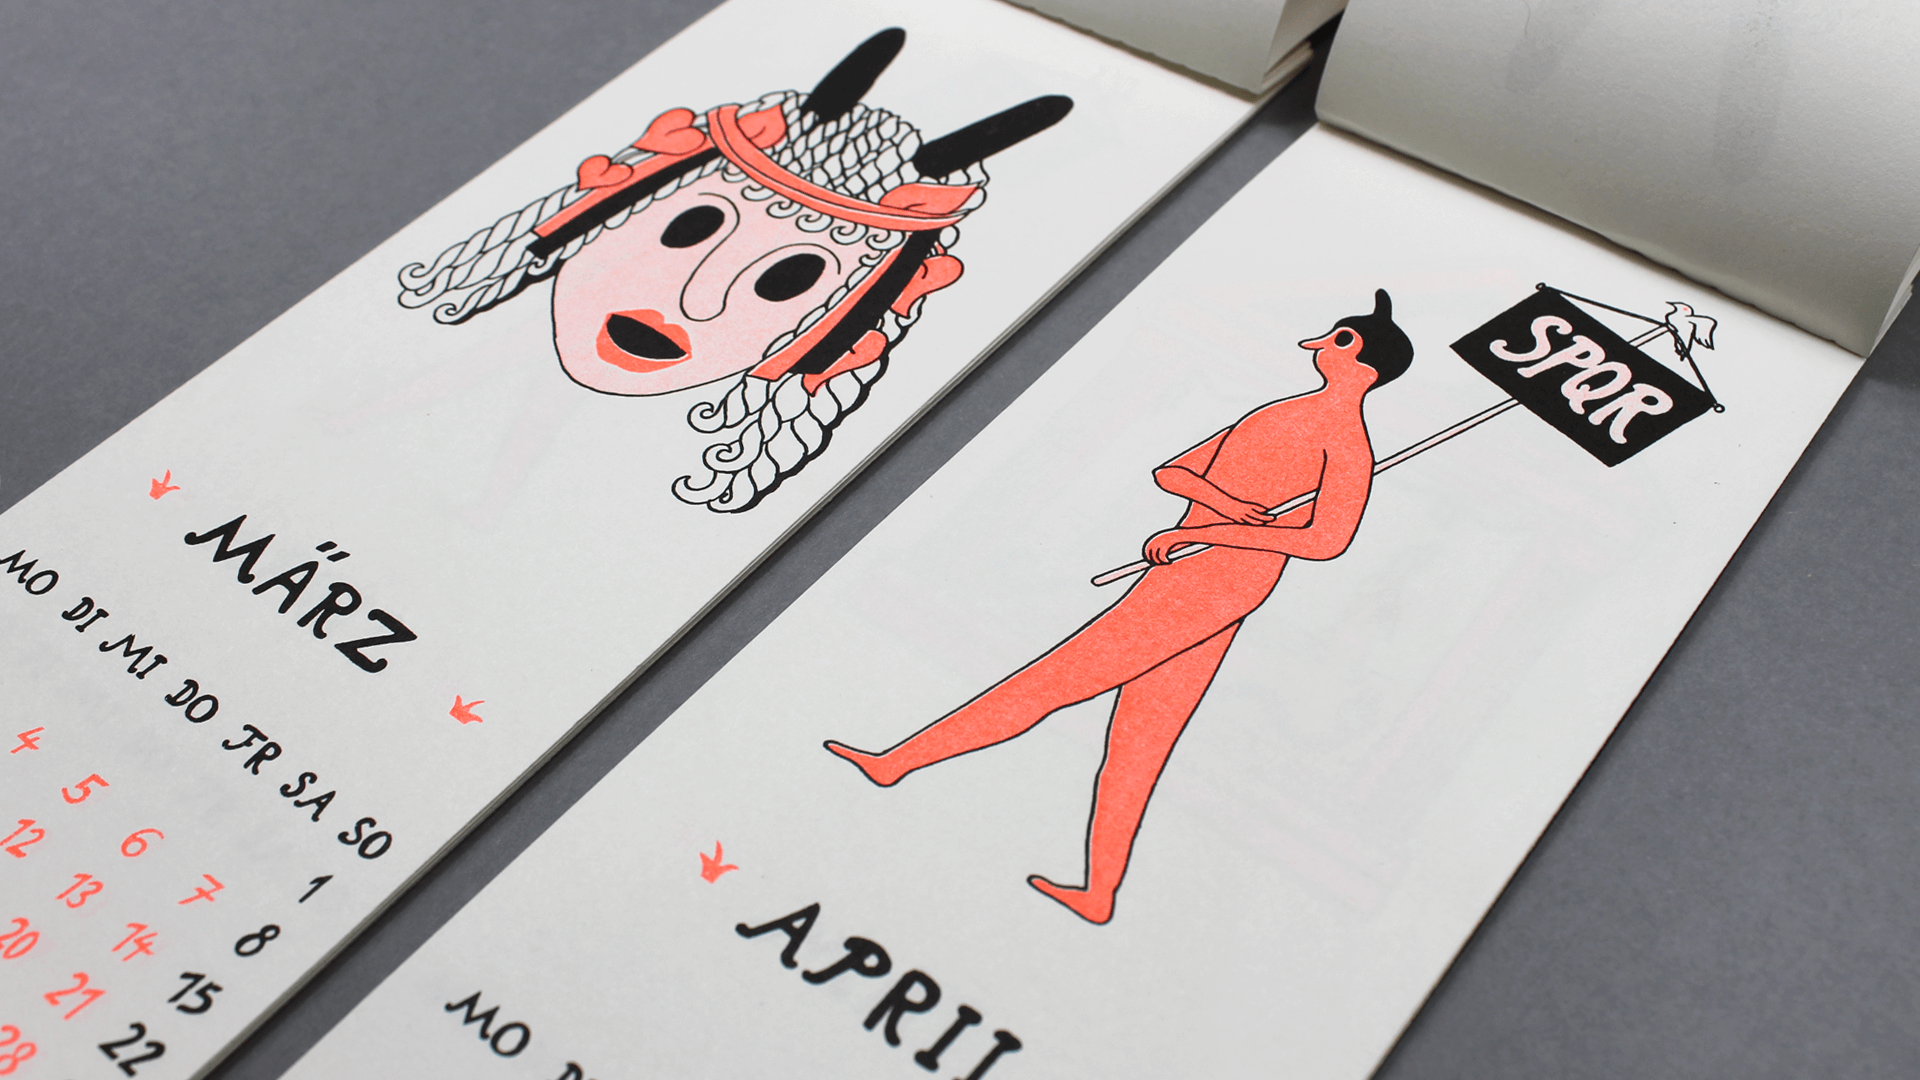 studio-goof studiogoof Julia Boehme calendar goof leipzig illustration